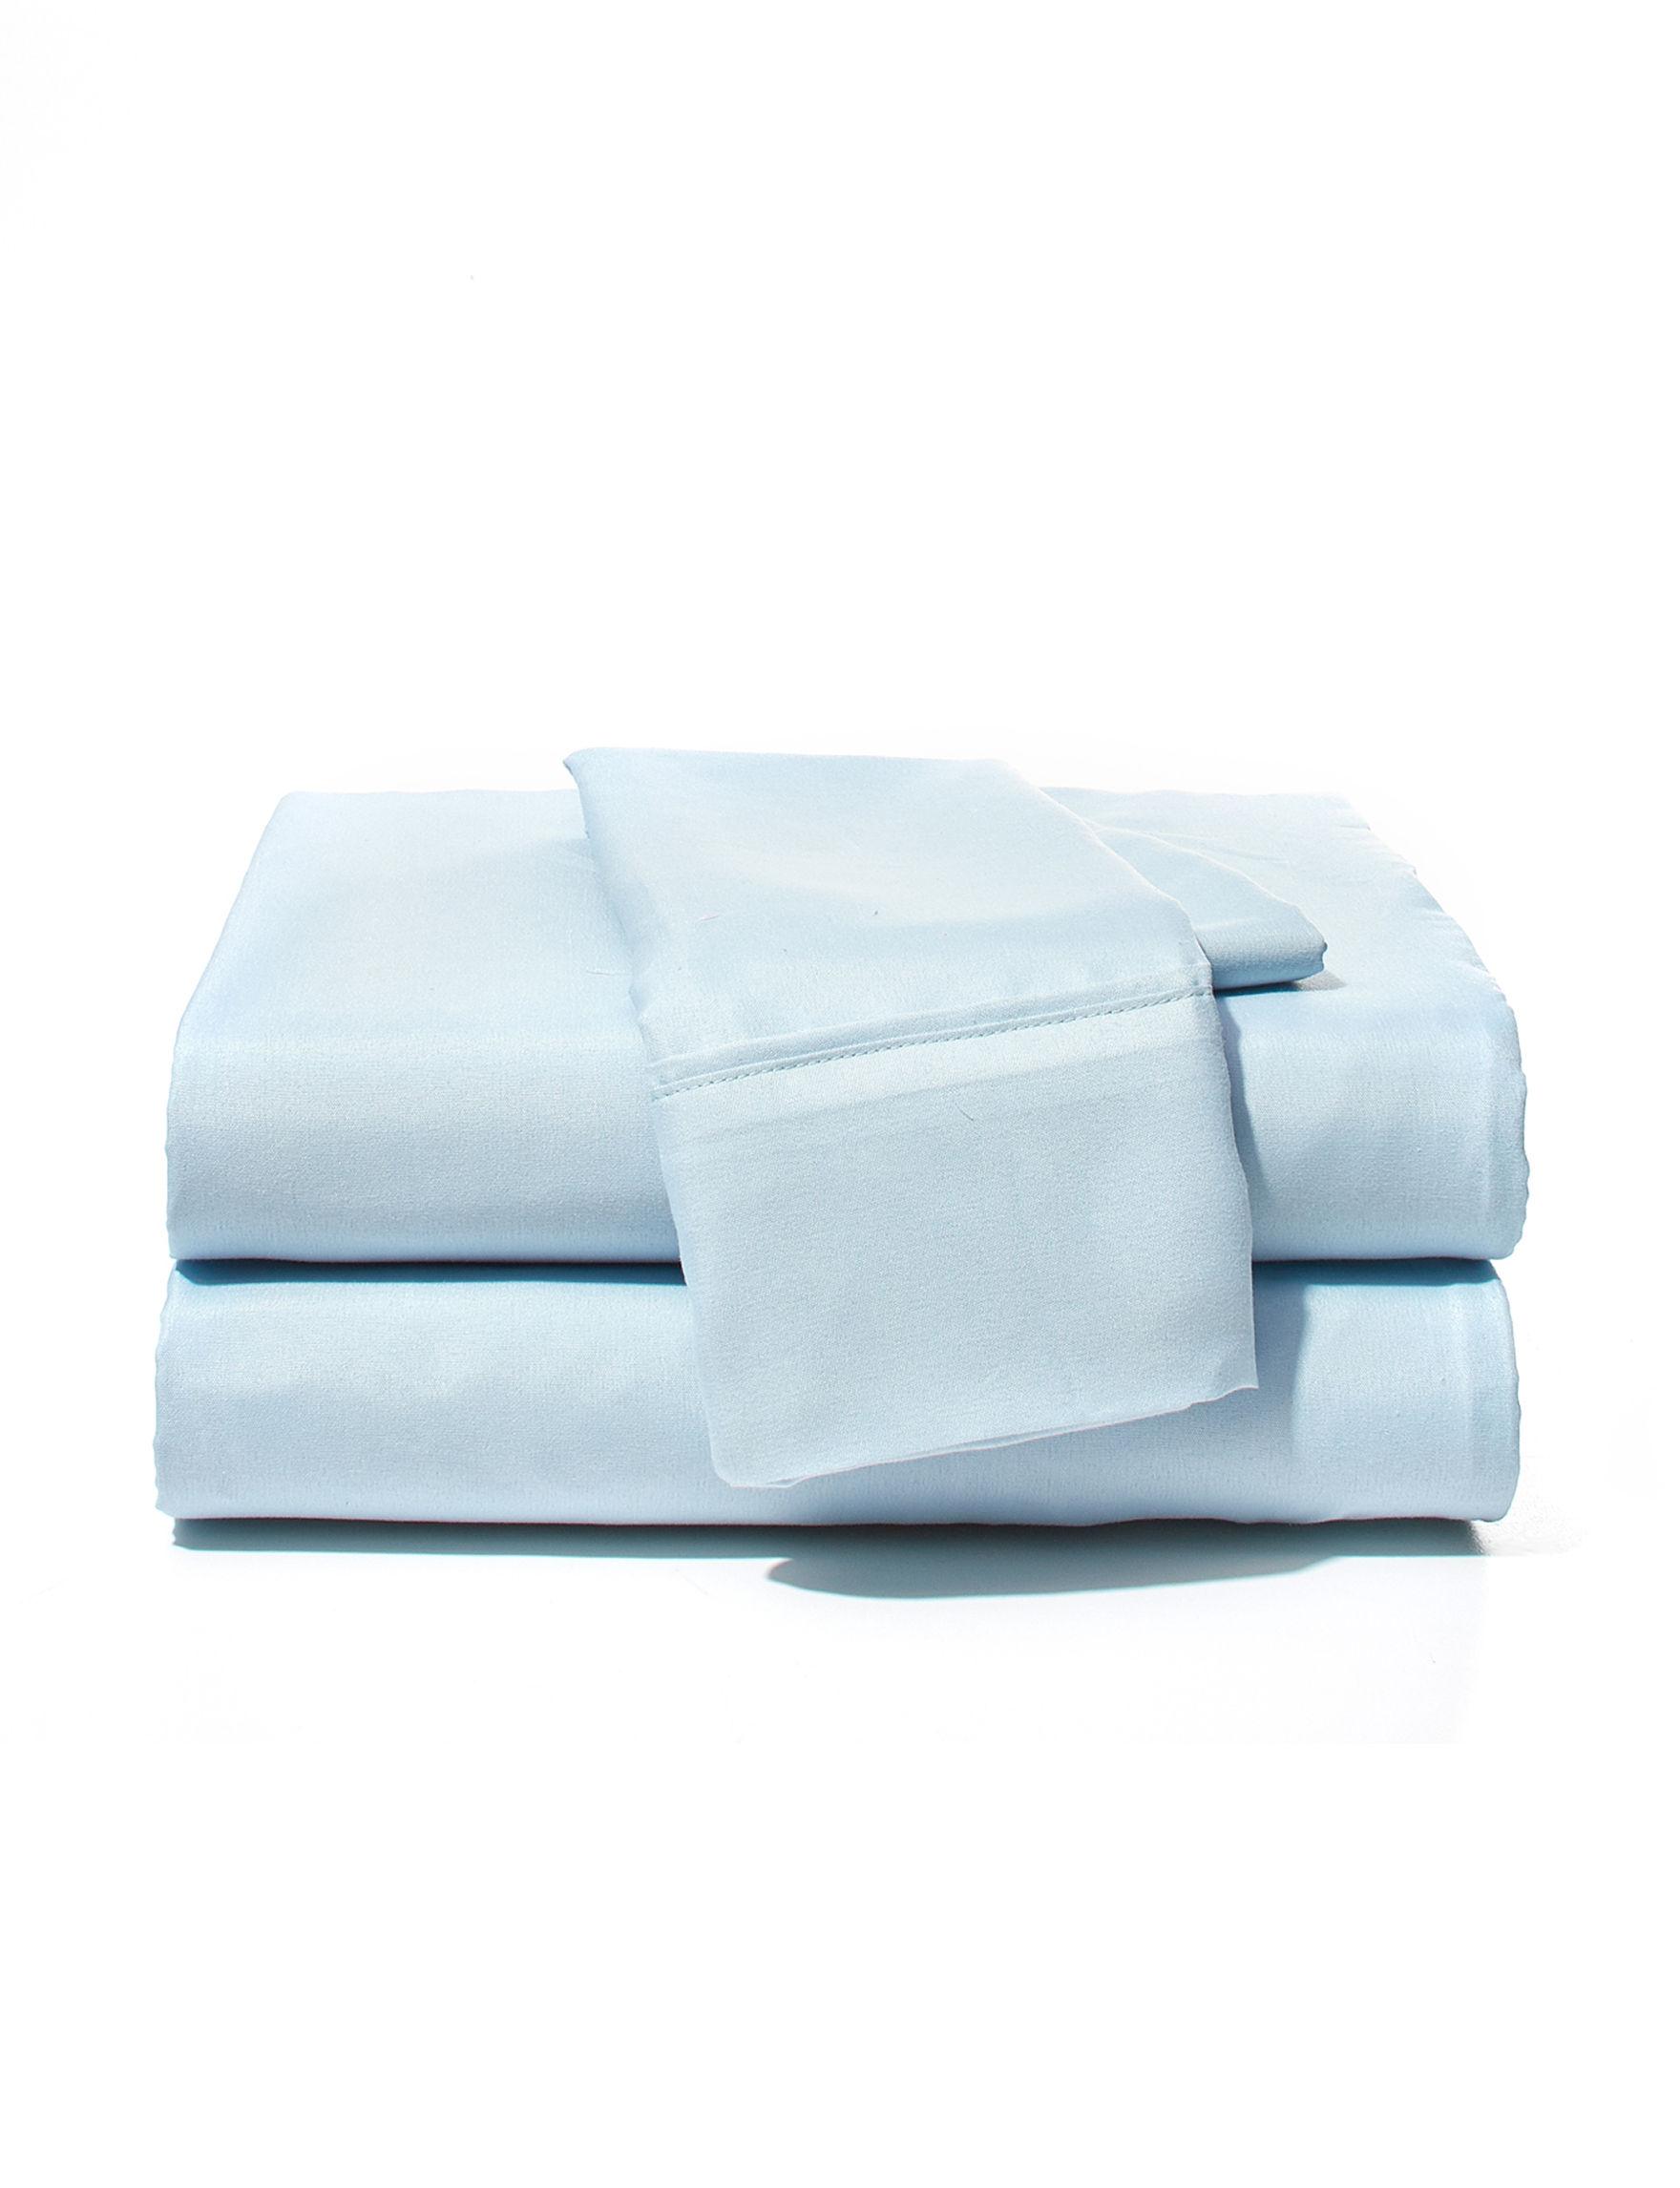 Harper Home Blue Sheets & Pillowcases